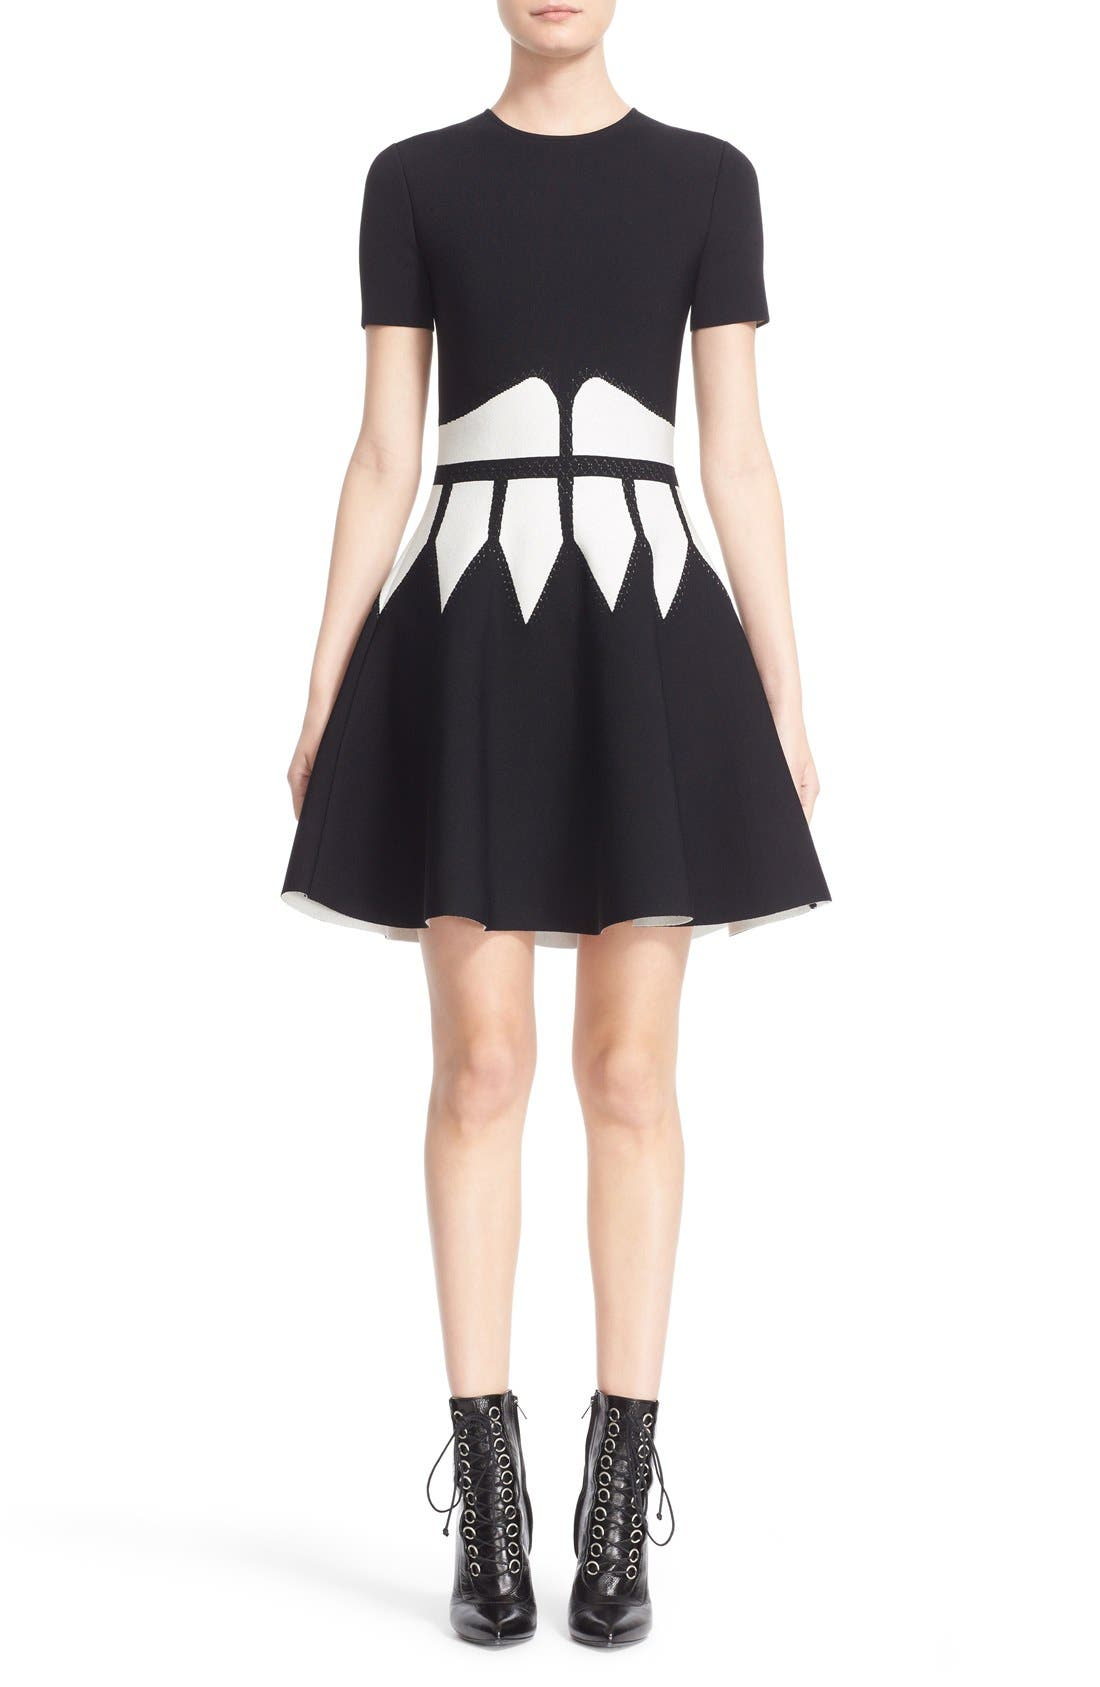 Alexander McQueen Intarsia Knit Fit & Flare Dress